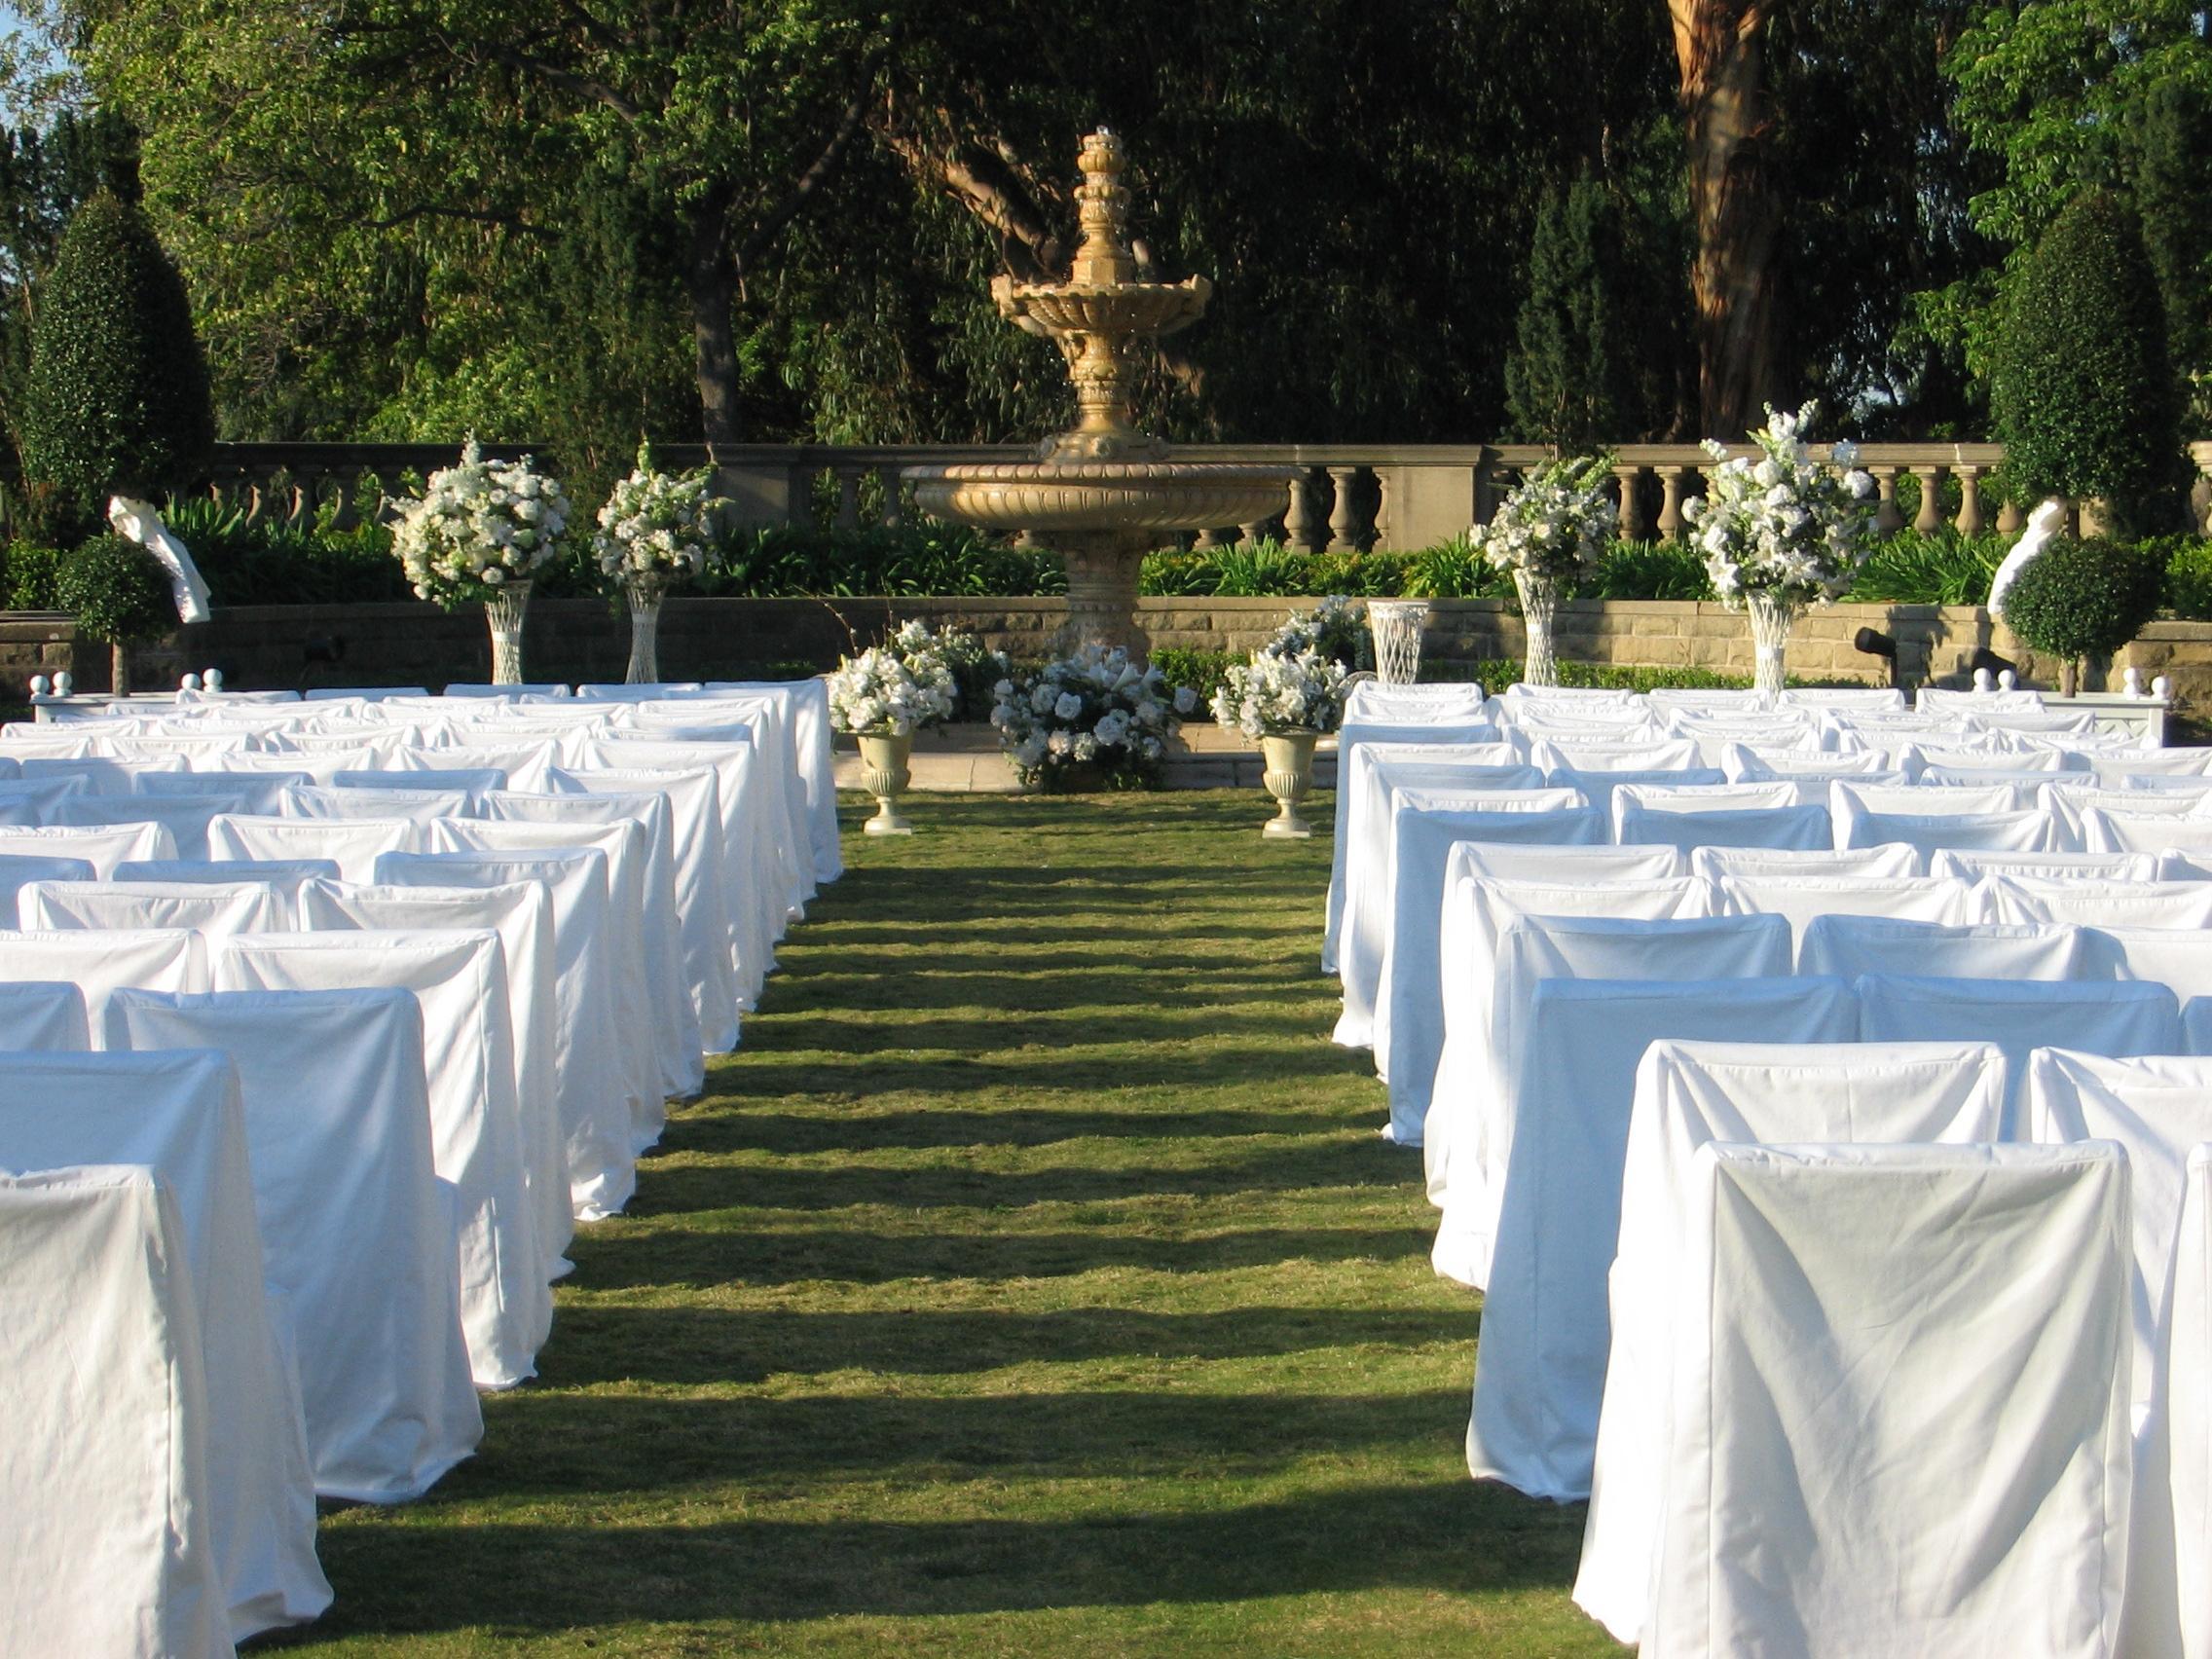 City Of Beverly Hills Formal Garden Floral Design on formal flower gardens, formal tropical gardens, formal victorian gardens,